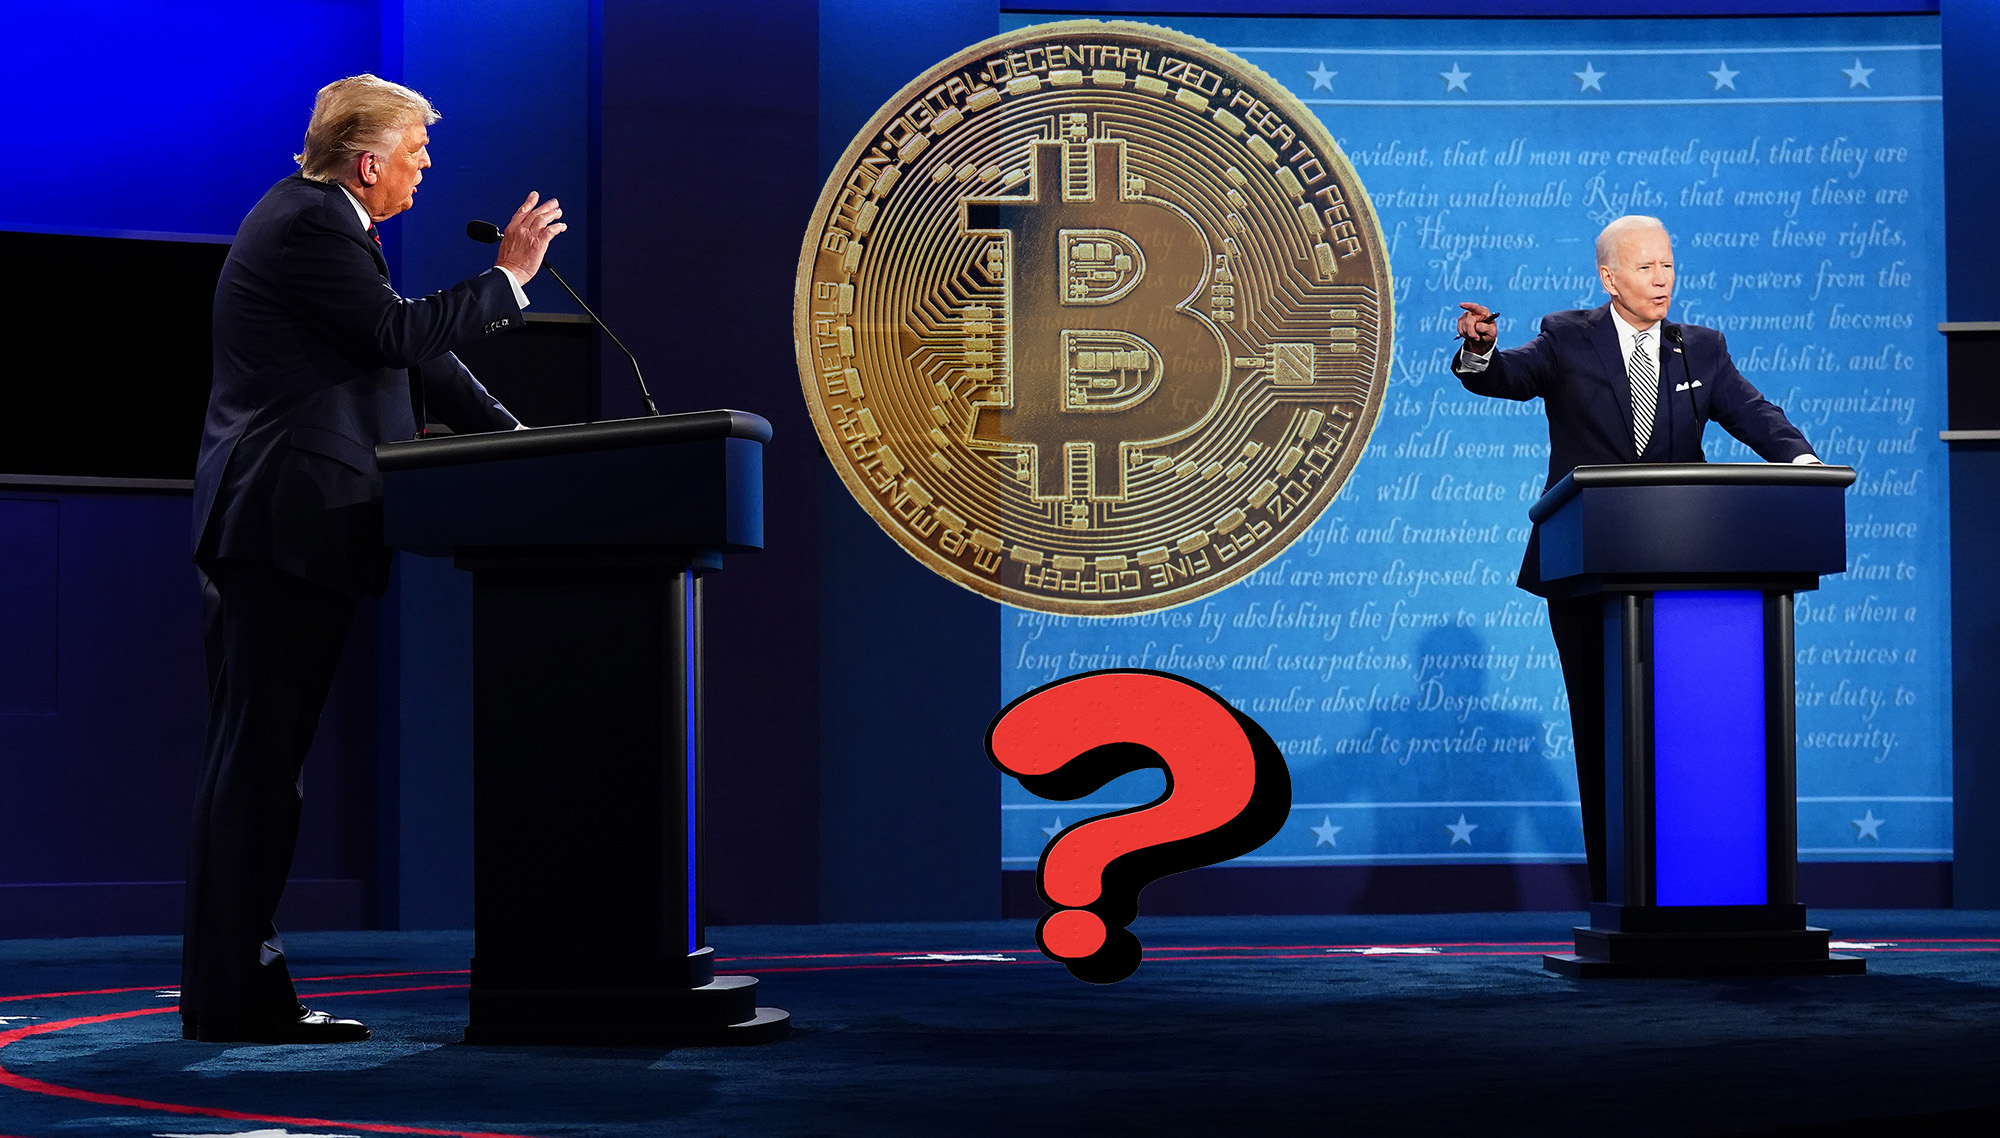 Donald Trump vs Joe Biden Bitcoin ve Kripto Paralar Icin Hangisi